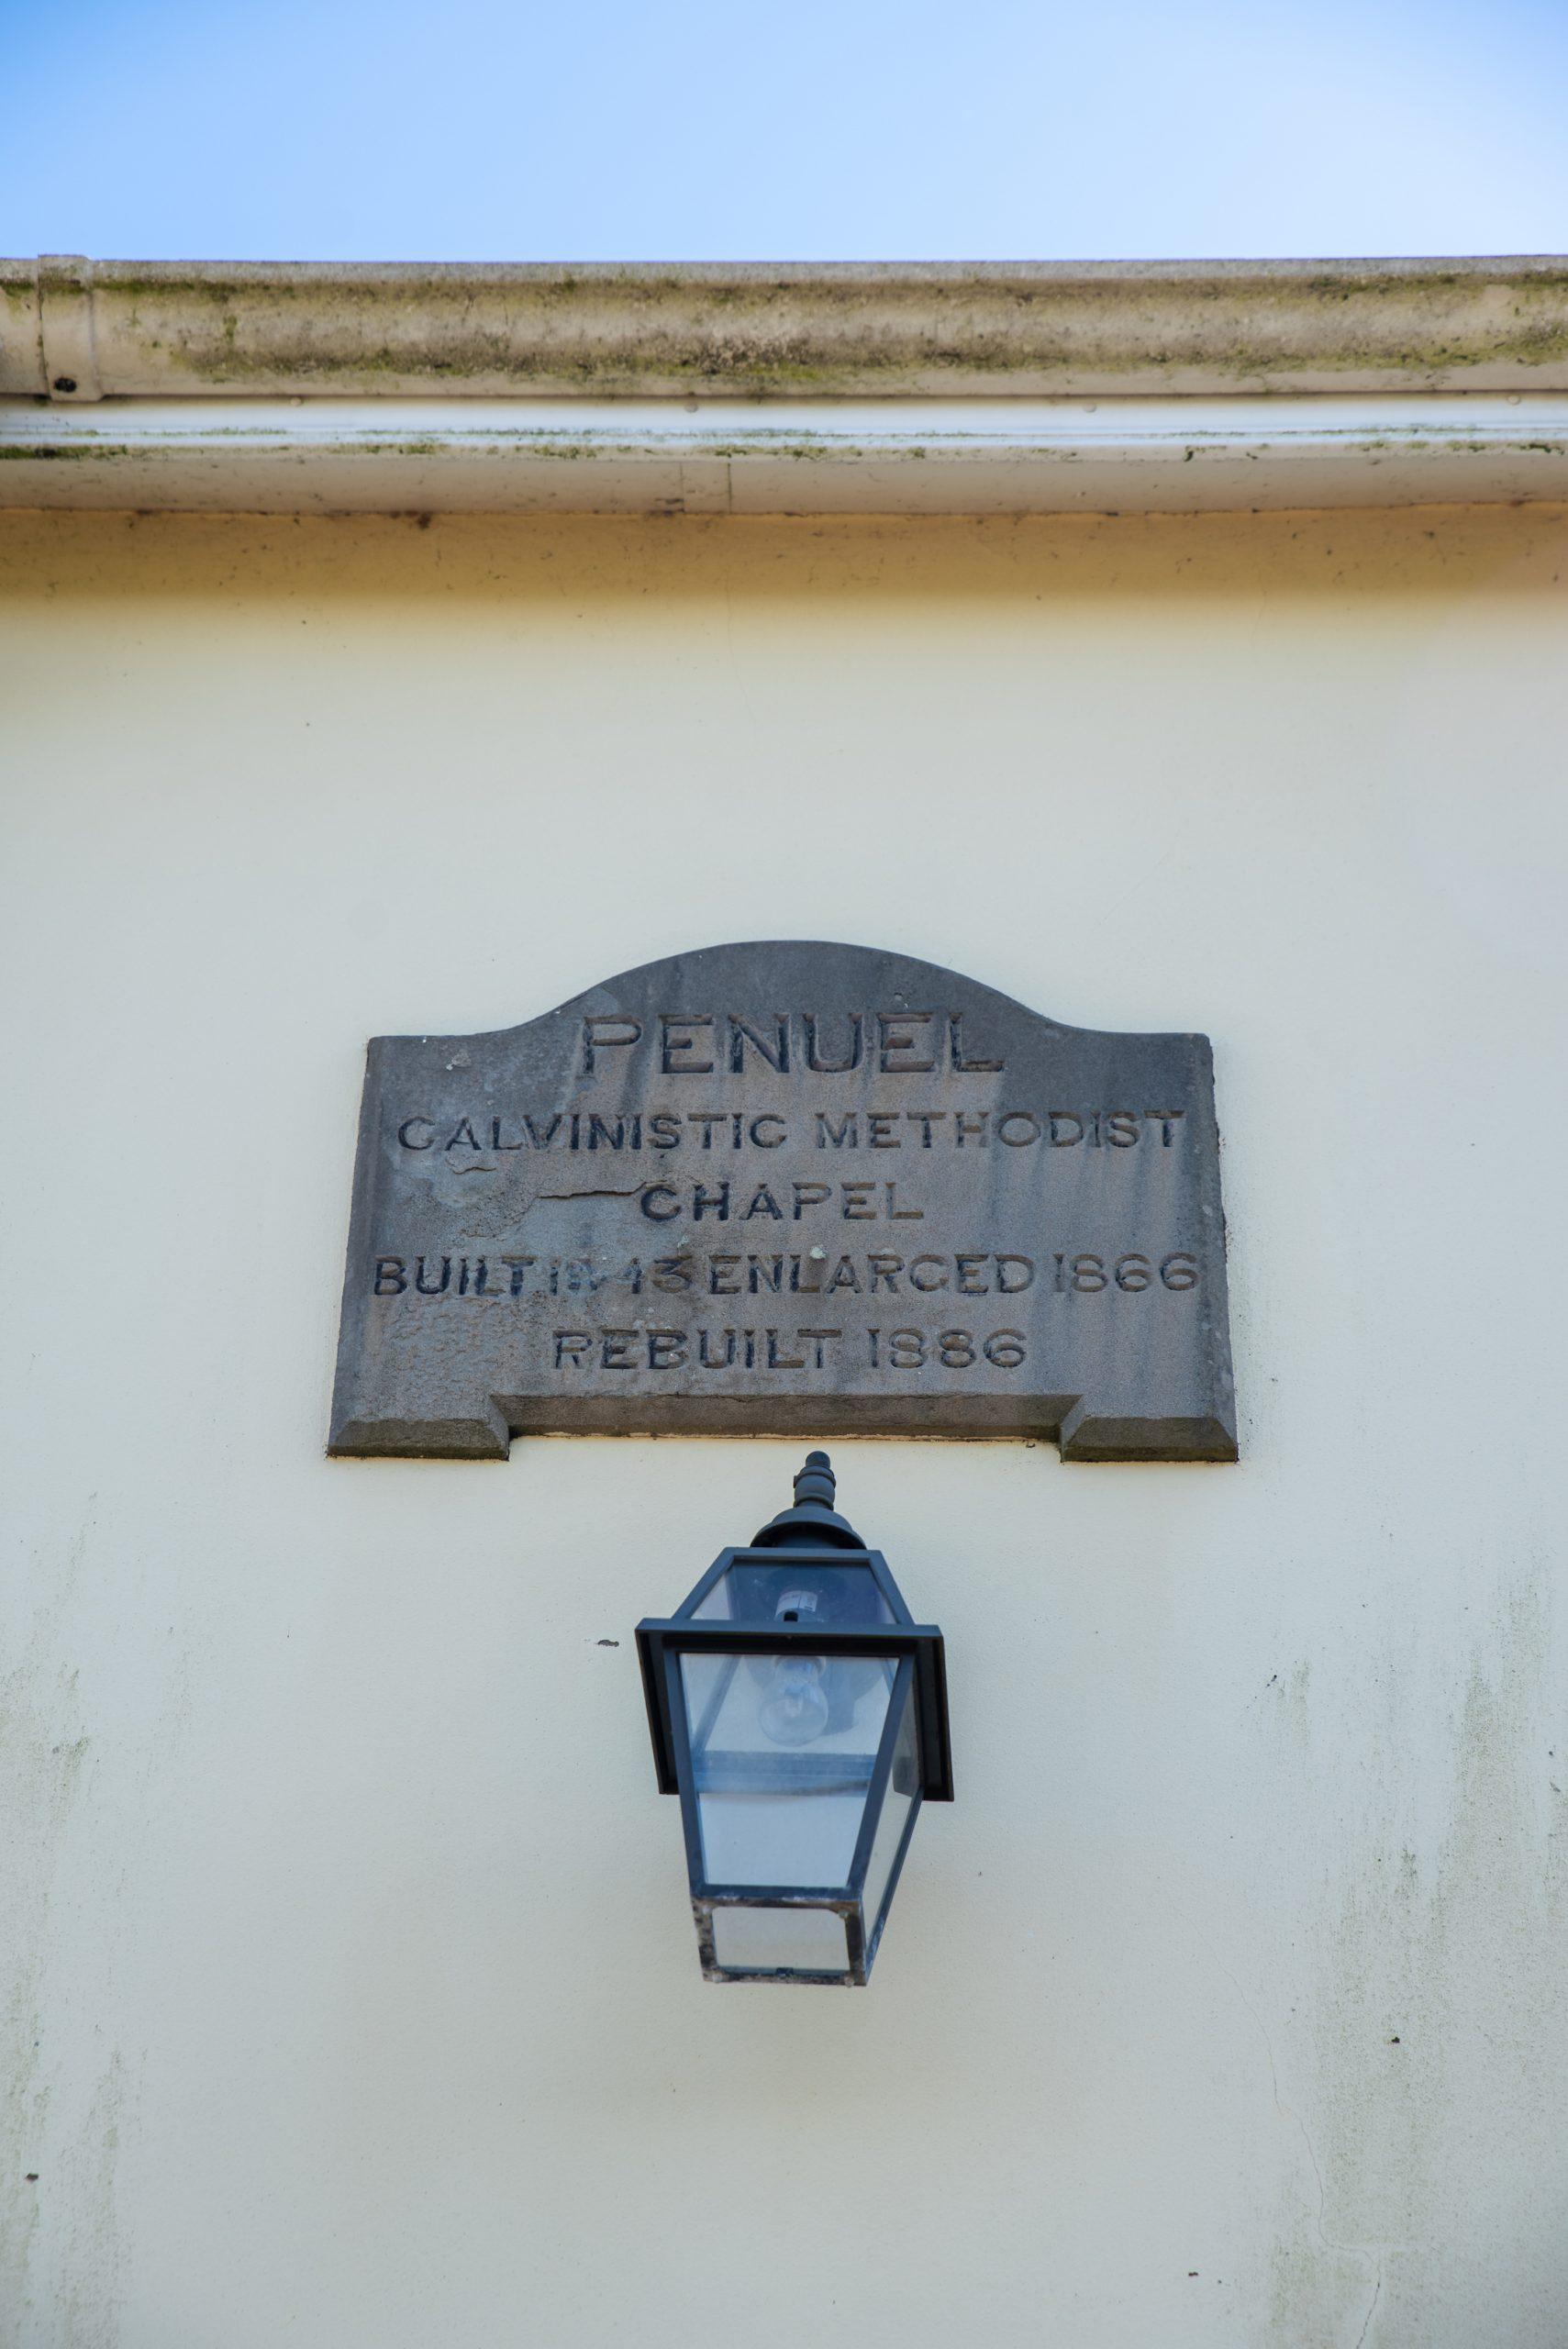 Gone for Good - Penuel Calvinistic Methodist Chapel, Penclawdd, Gower : Ben Holbrook73